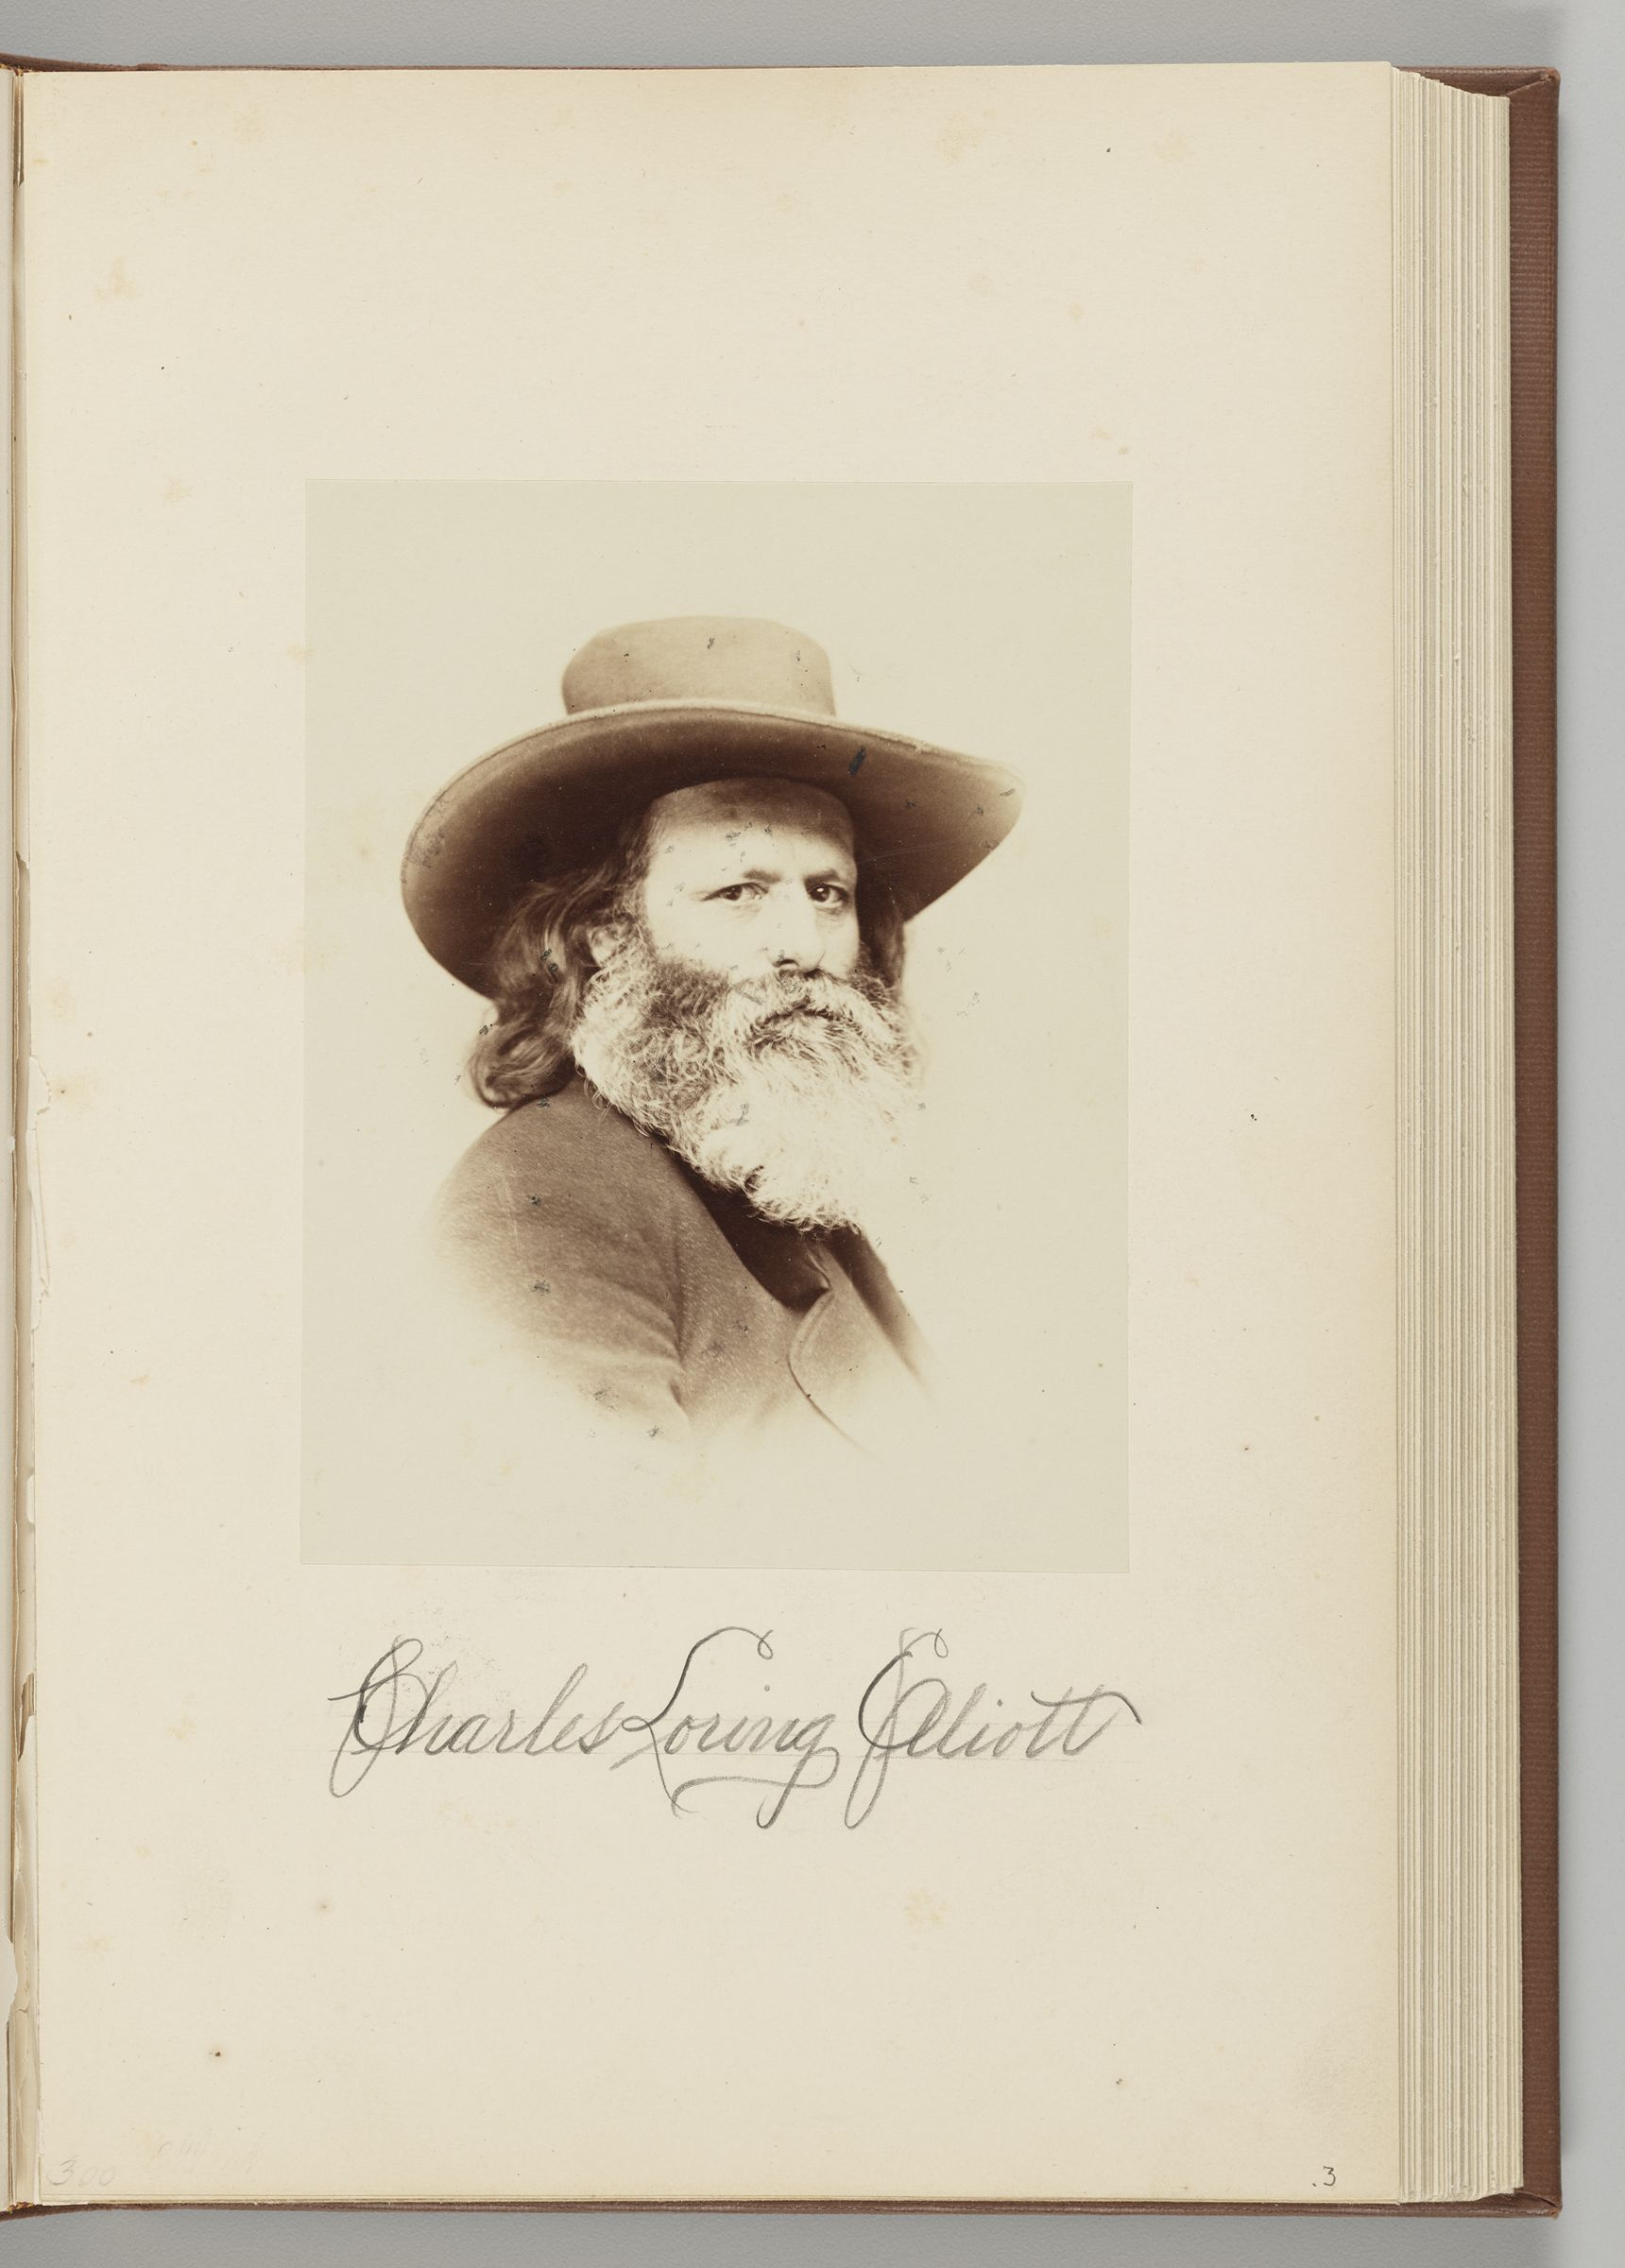 Charles Loring Elliott (1812-1868)